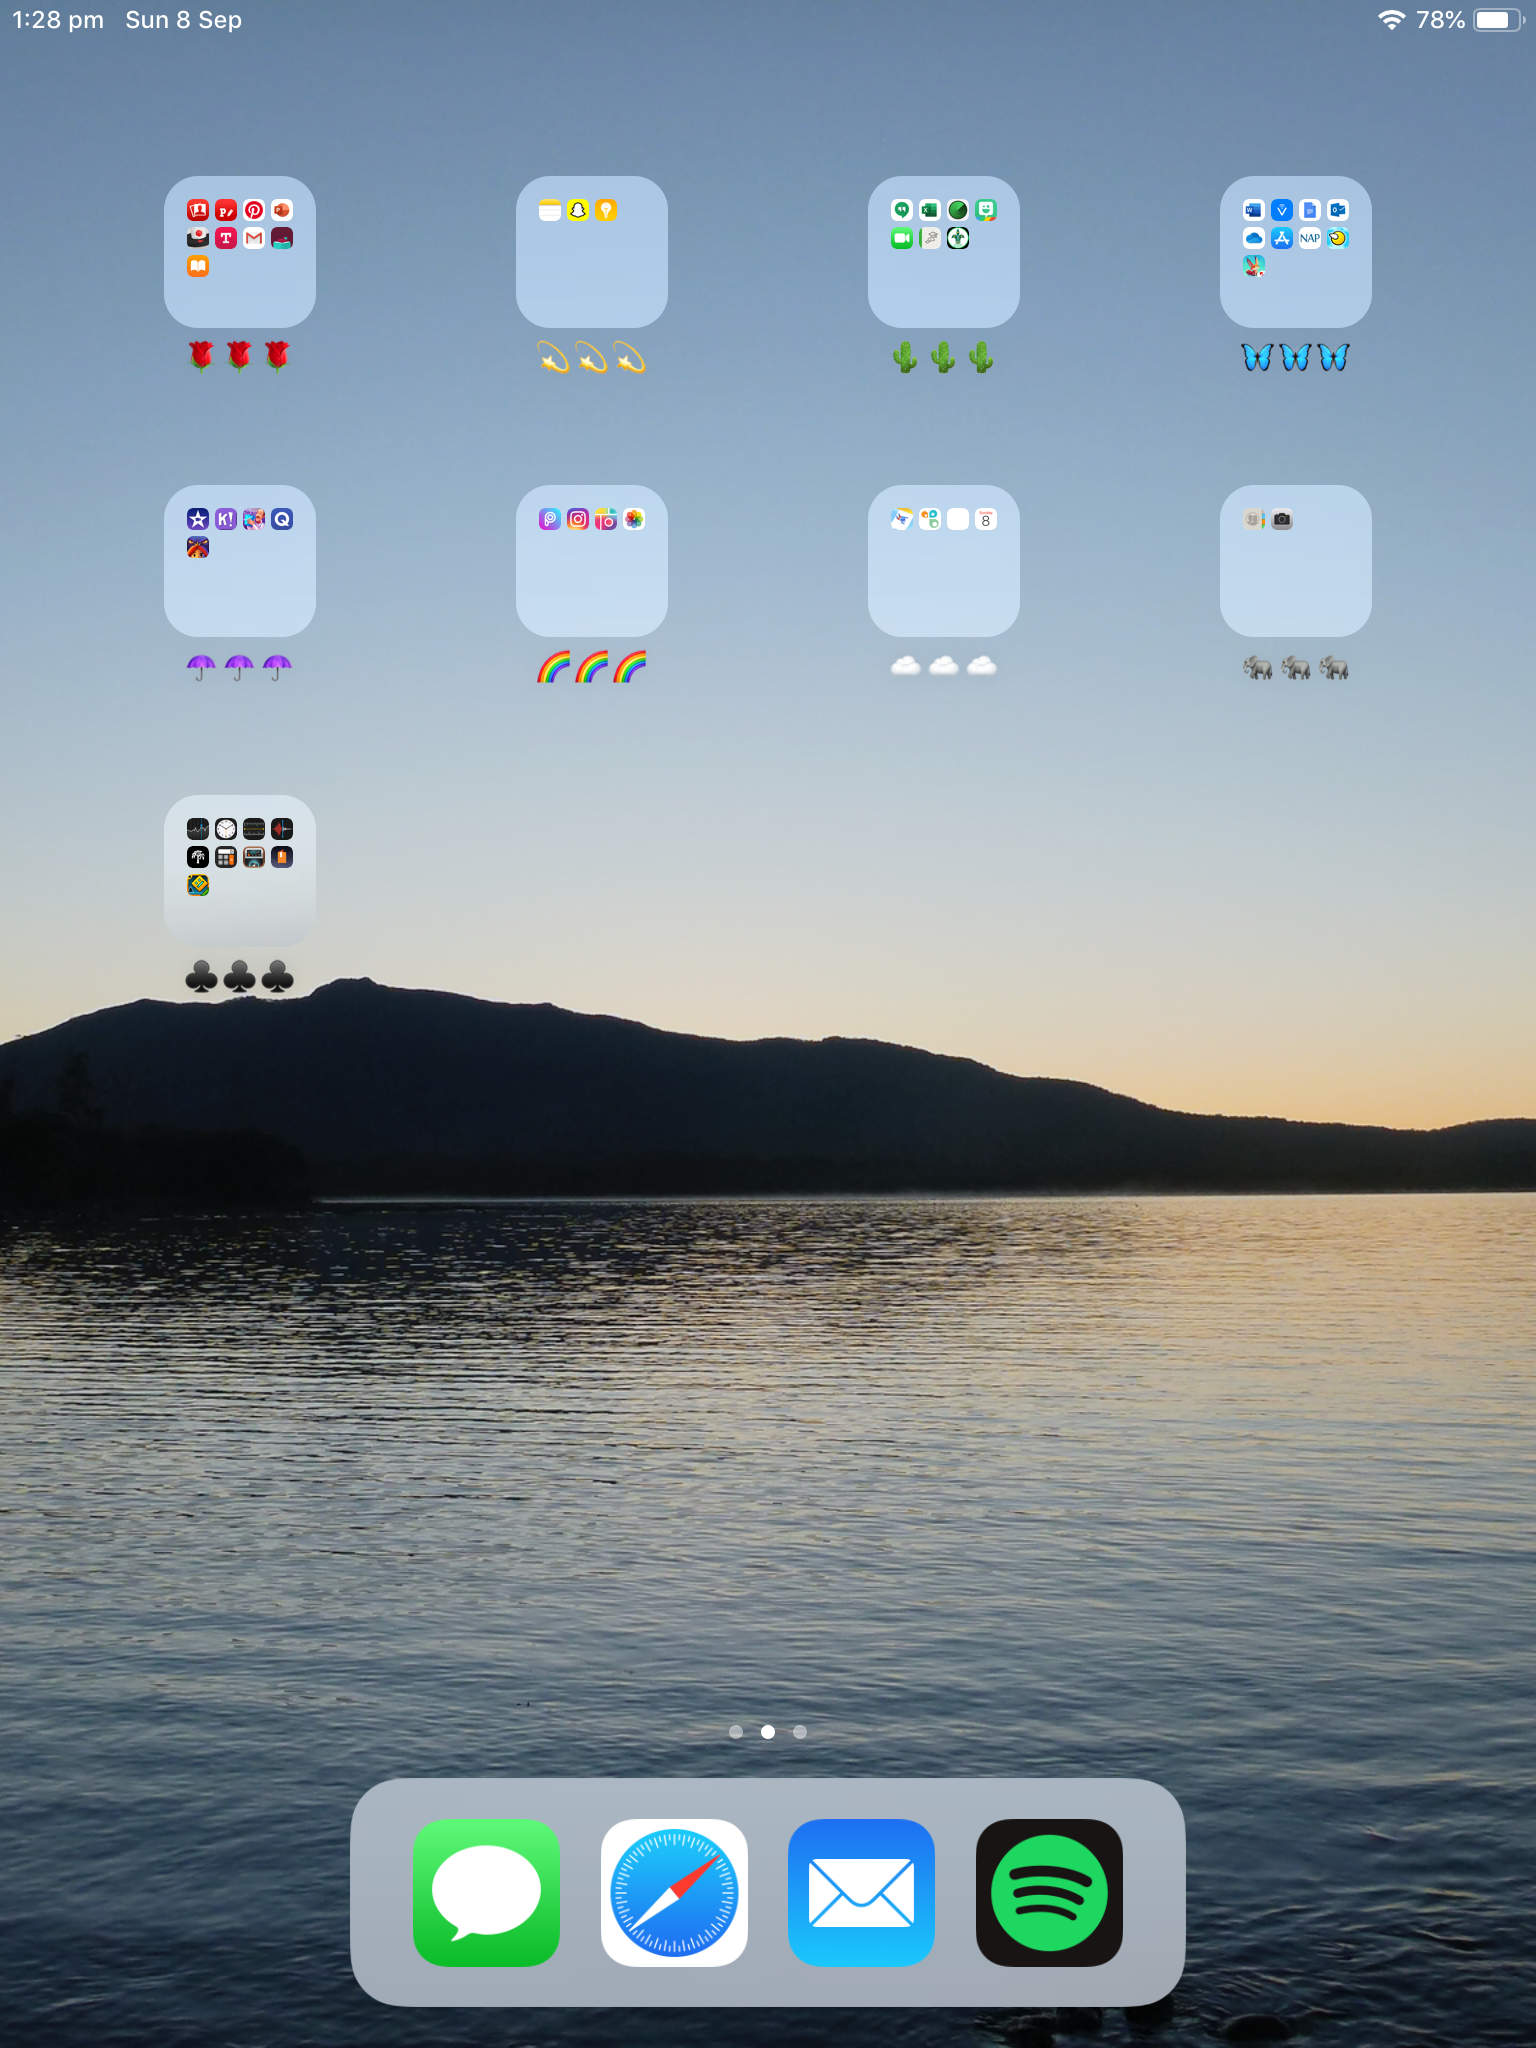 Home Screen Layout Aesthetic Emoji Combos Ipad Vsco Iphone Ipad Organizer Iphone Organization Organization Apps